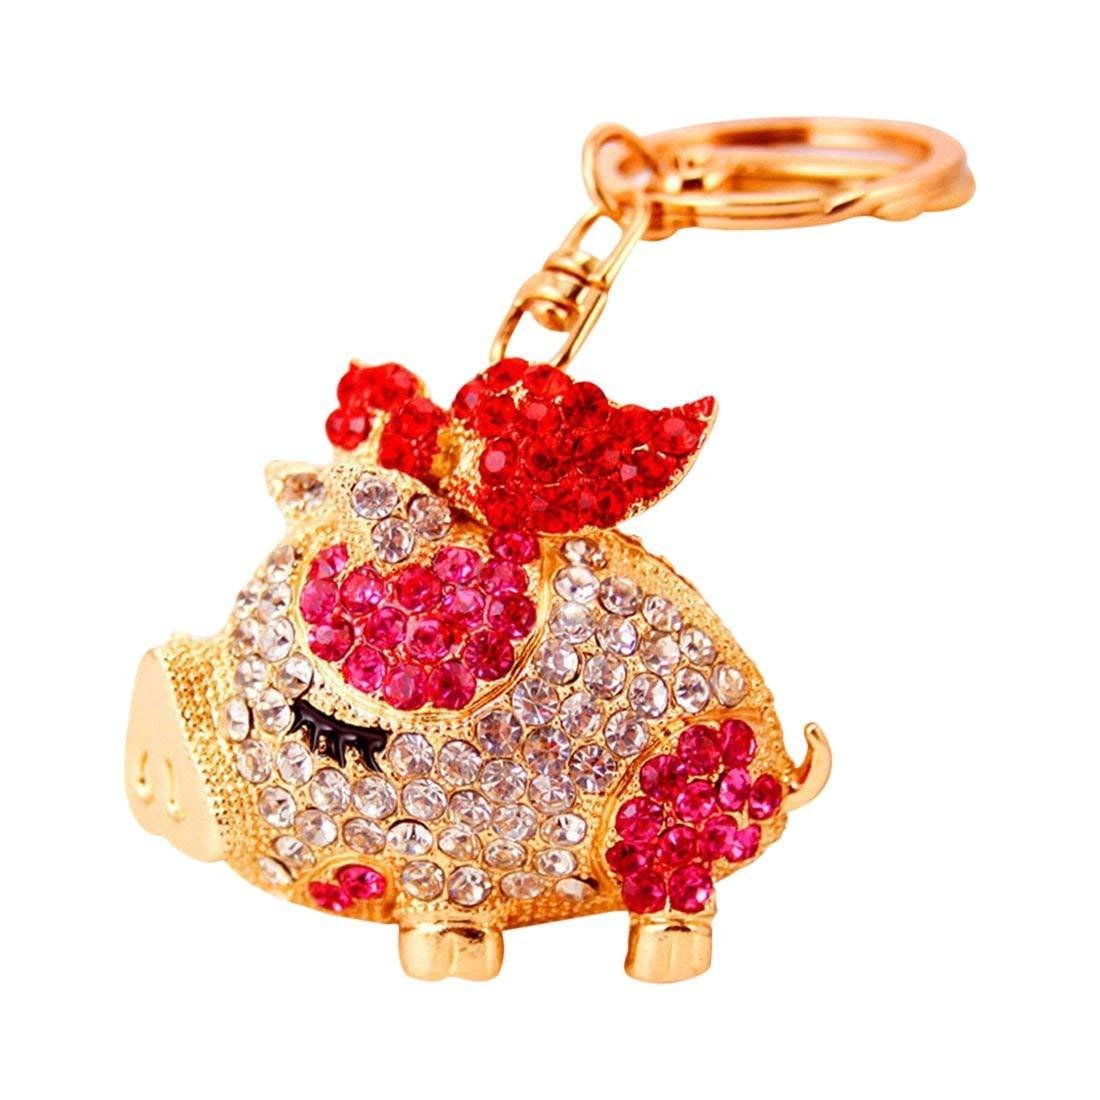 SODIAL(R) Fashion Novelty Gifts Trinket Rhinestone Cute Bow Pig Keychain, Women Bag Pendant Keyring (red)